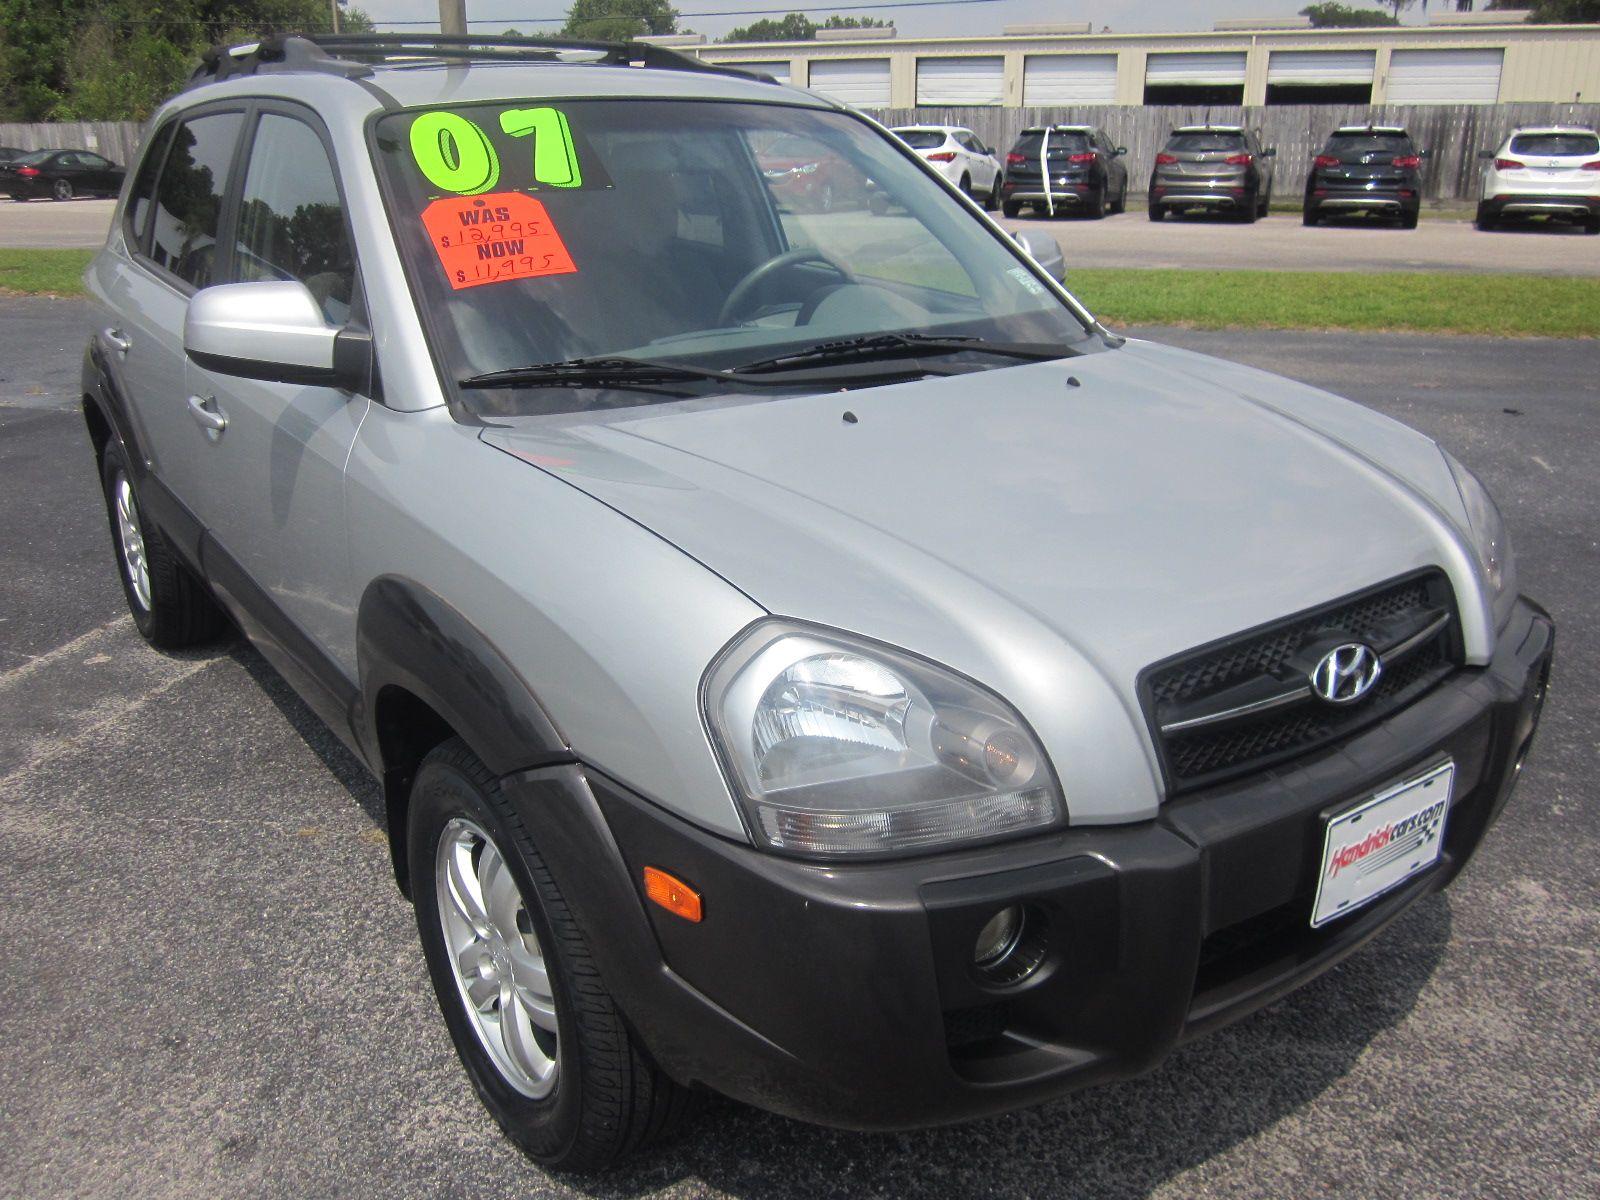 2007 Hyundai Tucson 11,995 Hendrick Hyundai Charleston